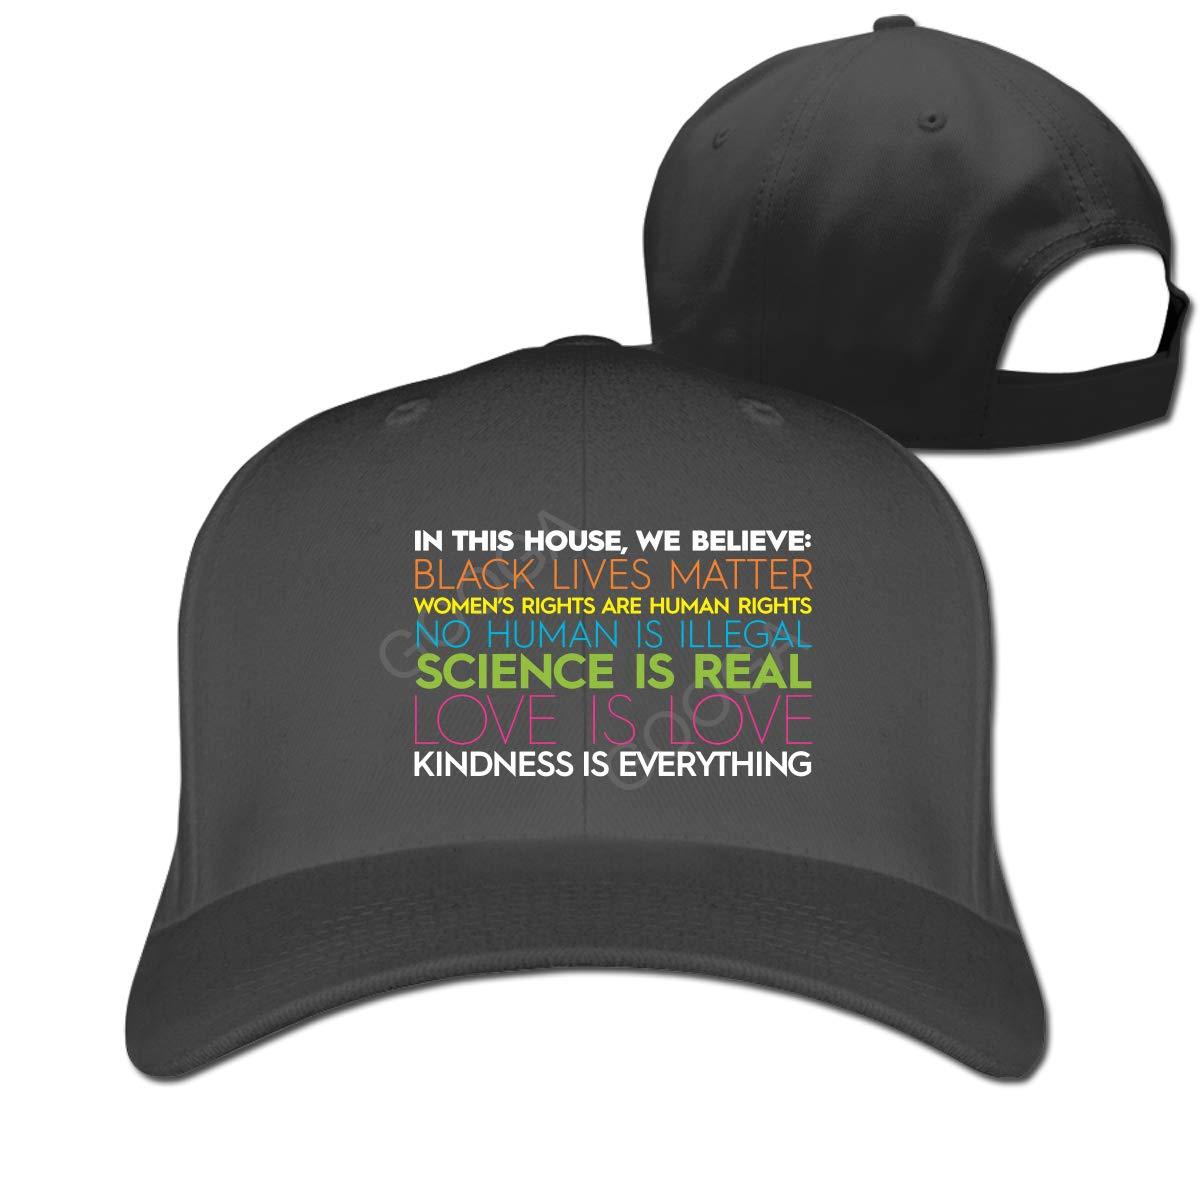 Black Lives Matter Fashion Adjustable Cotton Baseball Caps Trucker Driver Hat Outdoor Cap Black